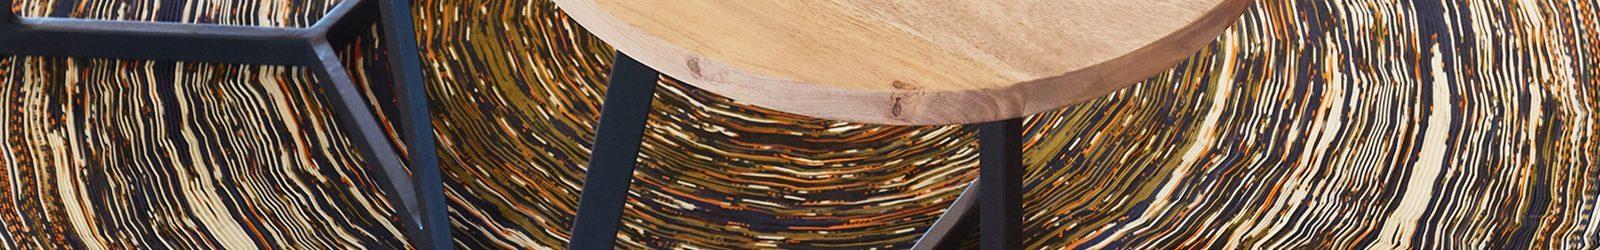 Circulaire-inrichting-Eosta-detail-vloerkleed-product-circularity-report-Circular-IQ